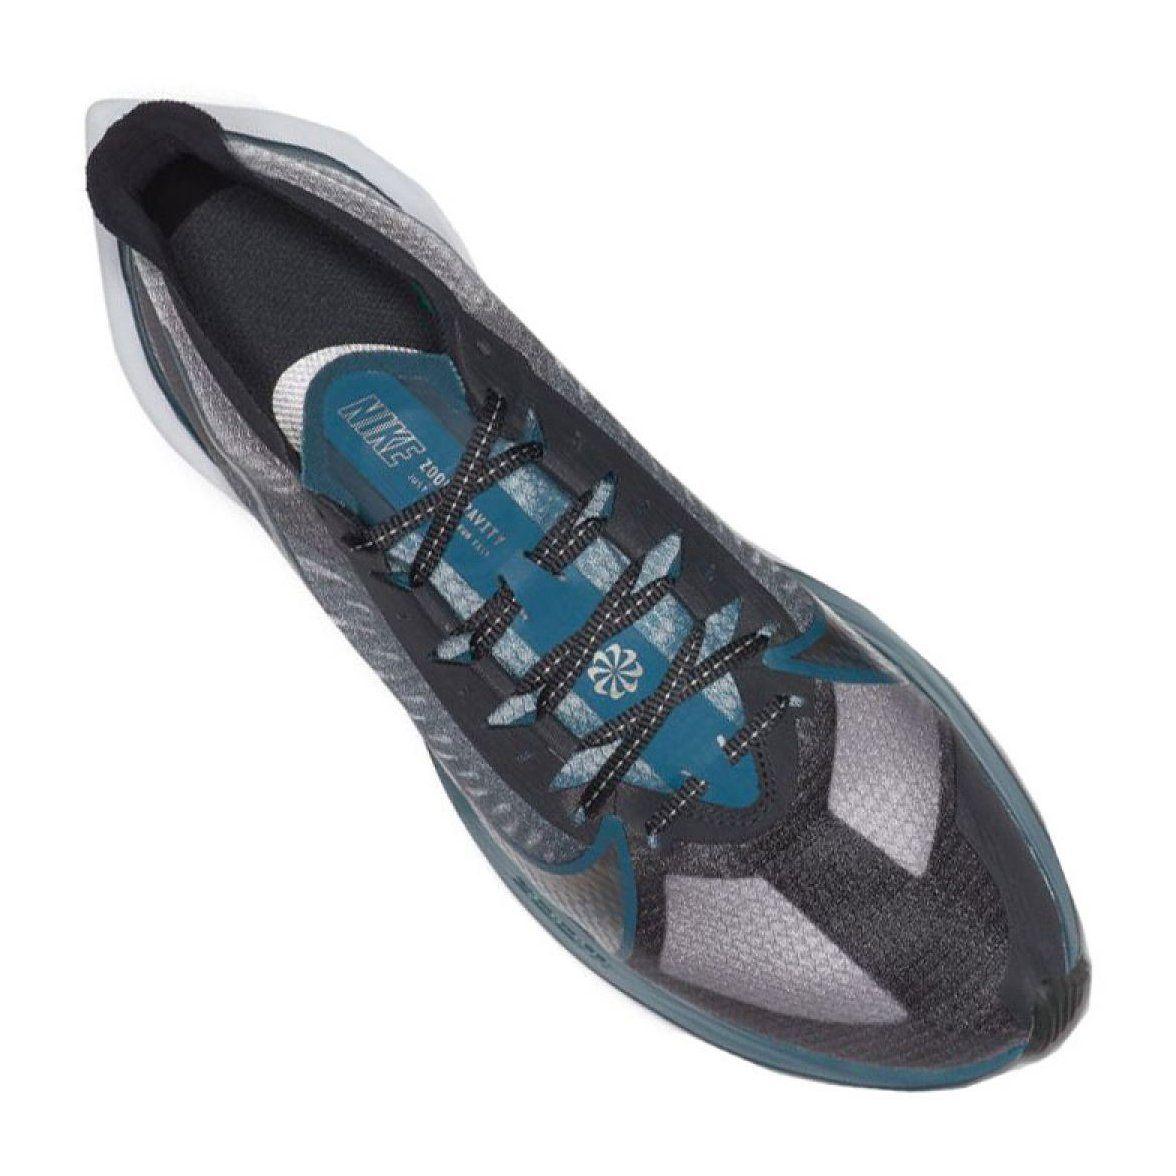 Buty Nike Zoom Gravity M Bq3202 002 Szare Nike Zoom Shoes Running Shoes Nike